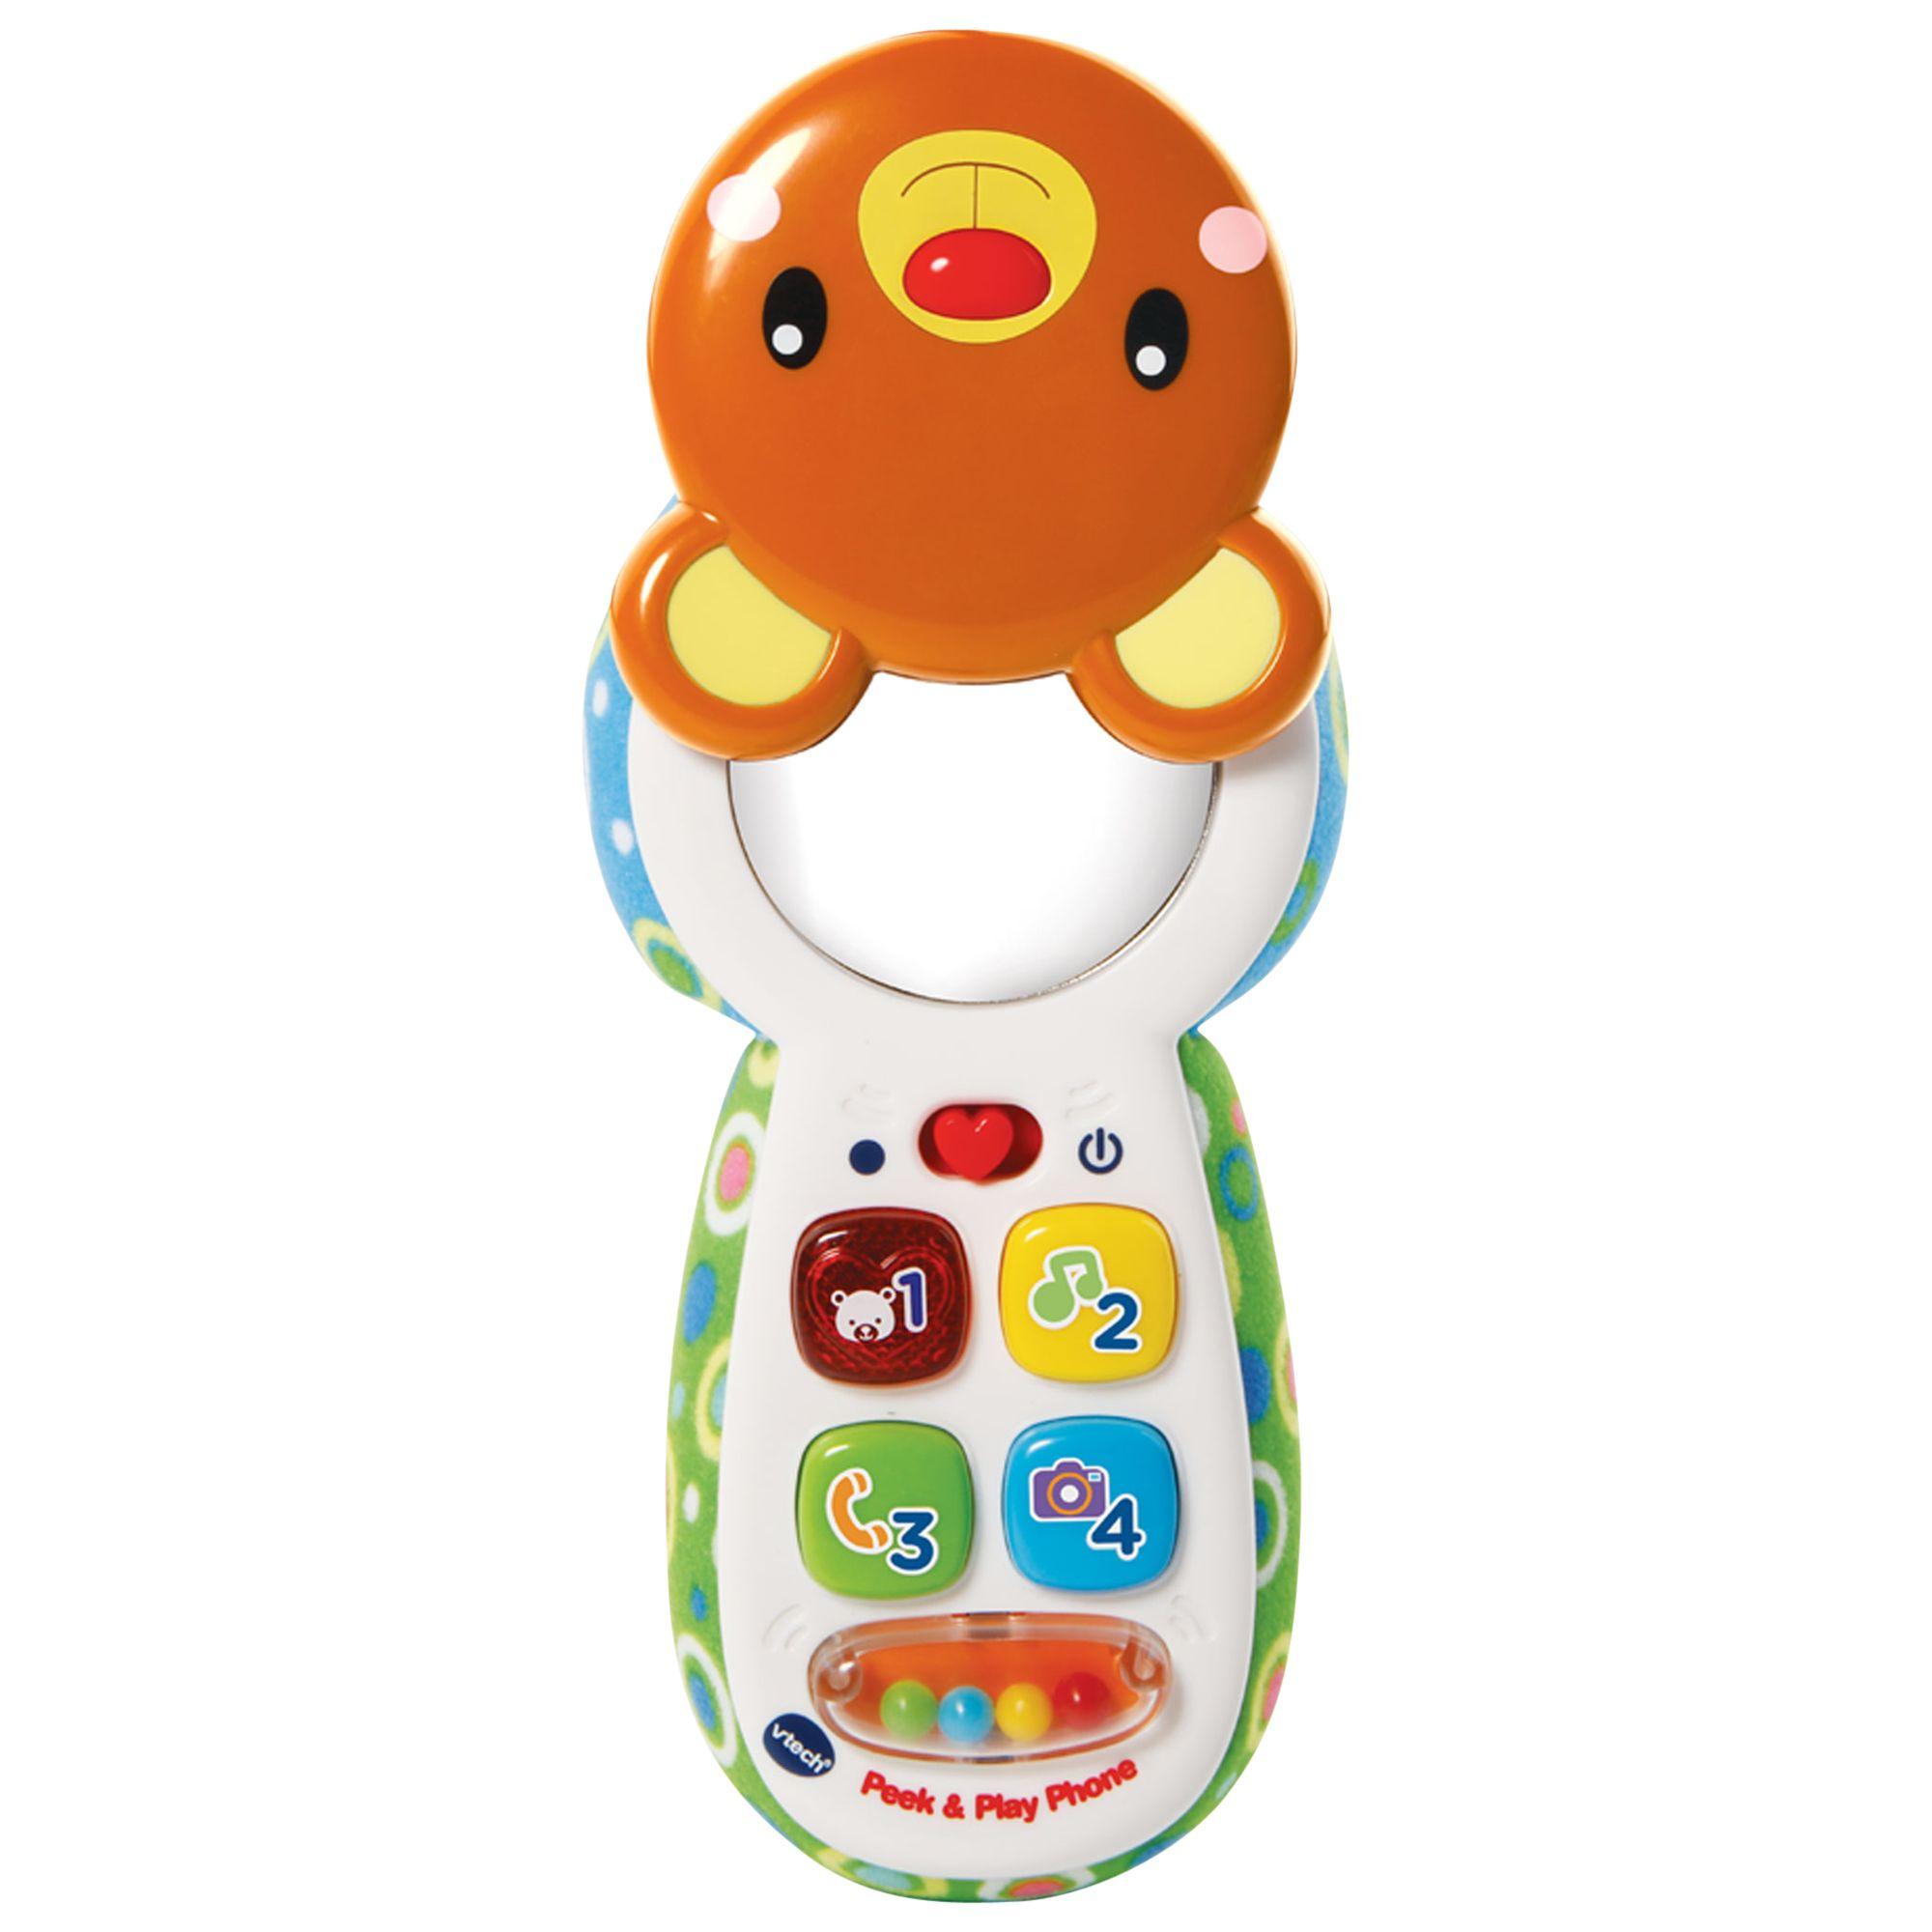 Vtech VTech Peek & Play Phone Baby Toy